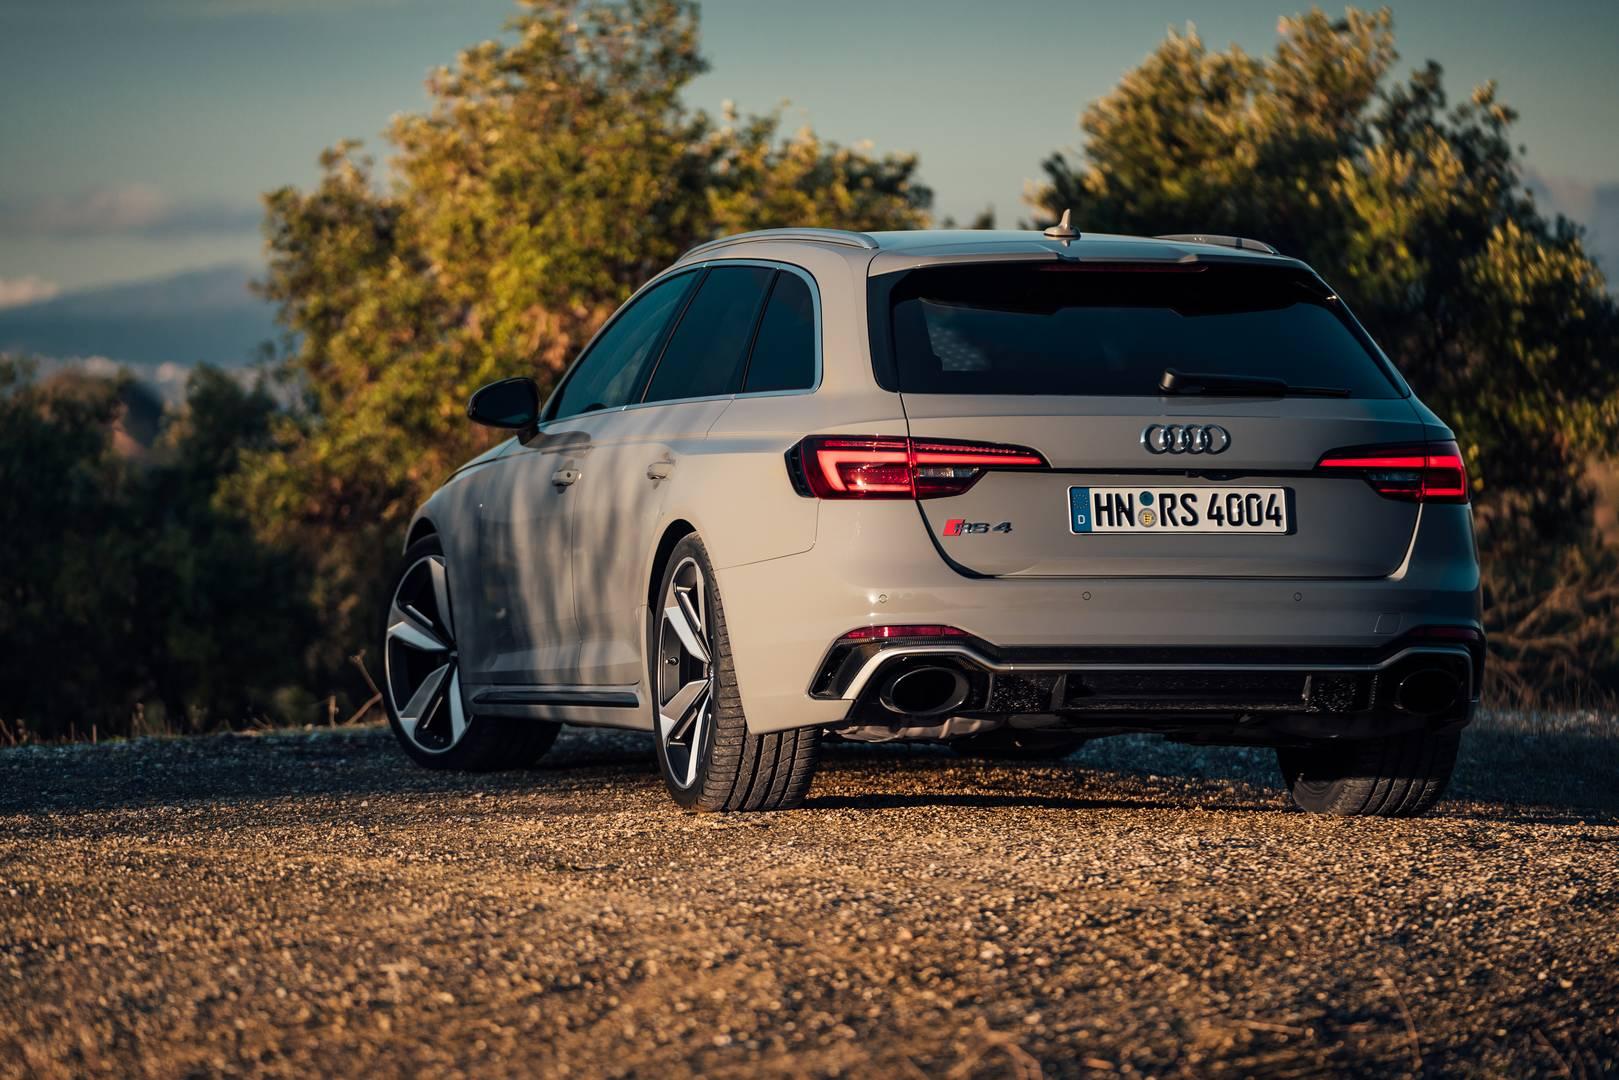 2018 Audi Rs4 Avant 1 Of 15 The